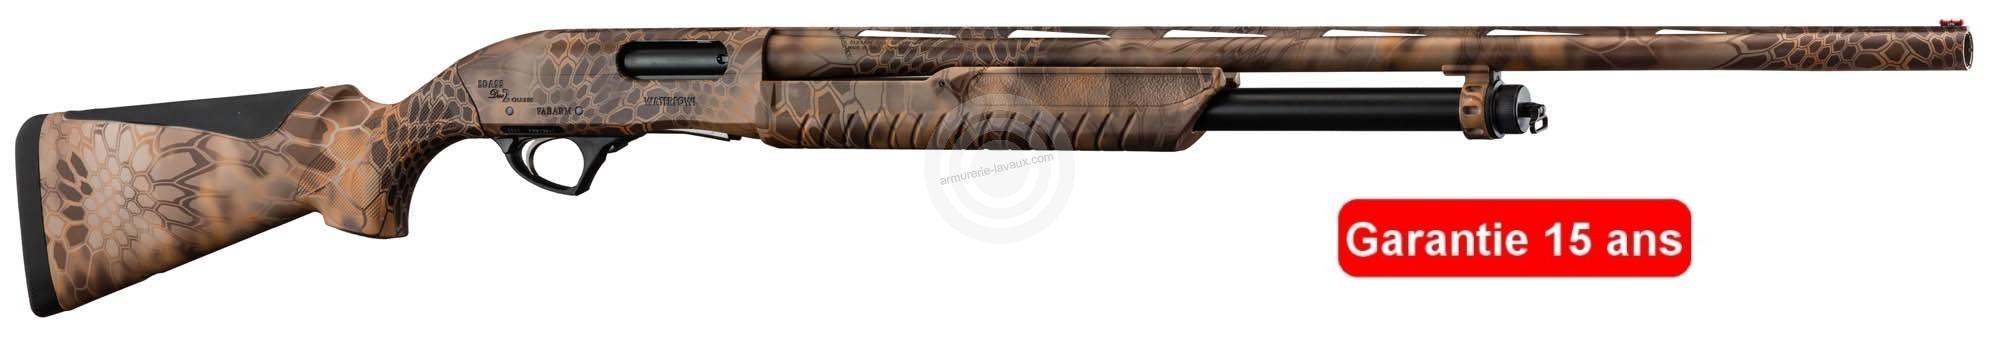 Fusil à pompe FABARM SDASS Waterfowl BANSHEE cal.12/76 (canon de 76cm)